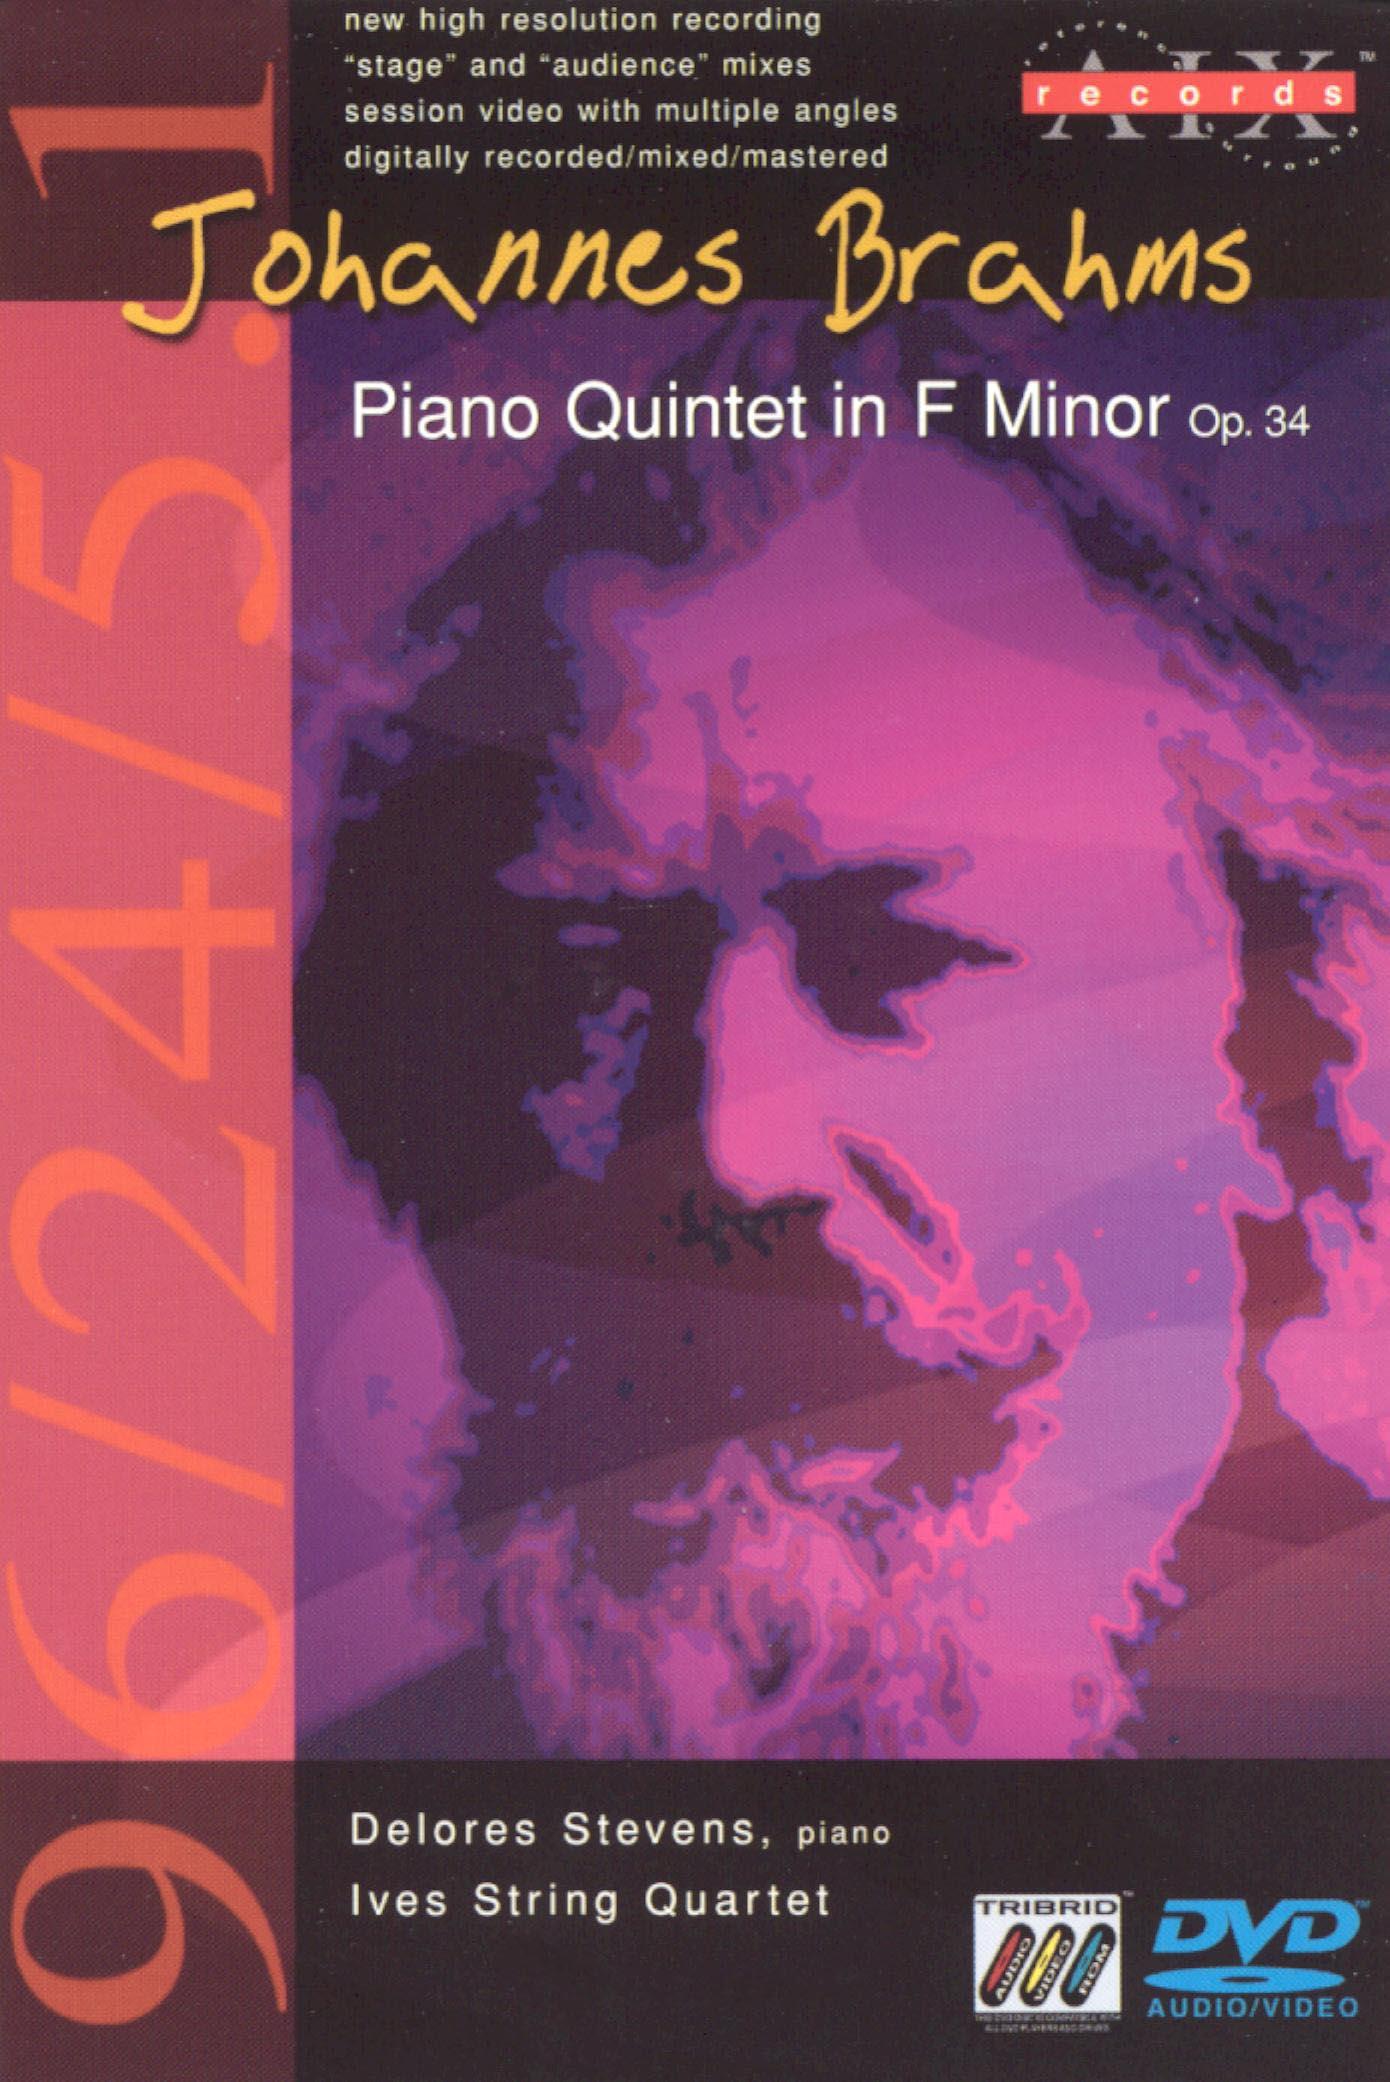 Delores Stevens/Ives String Quartet: Johannes Brahms - Piano Quintet in F Minor, Op.34